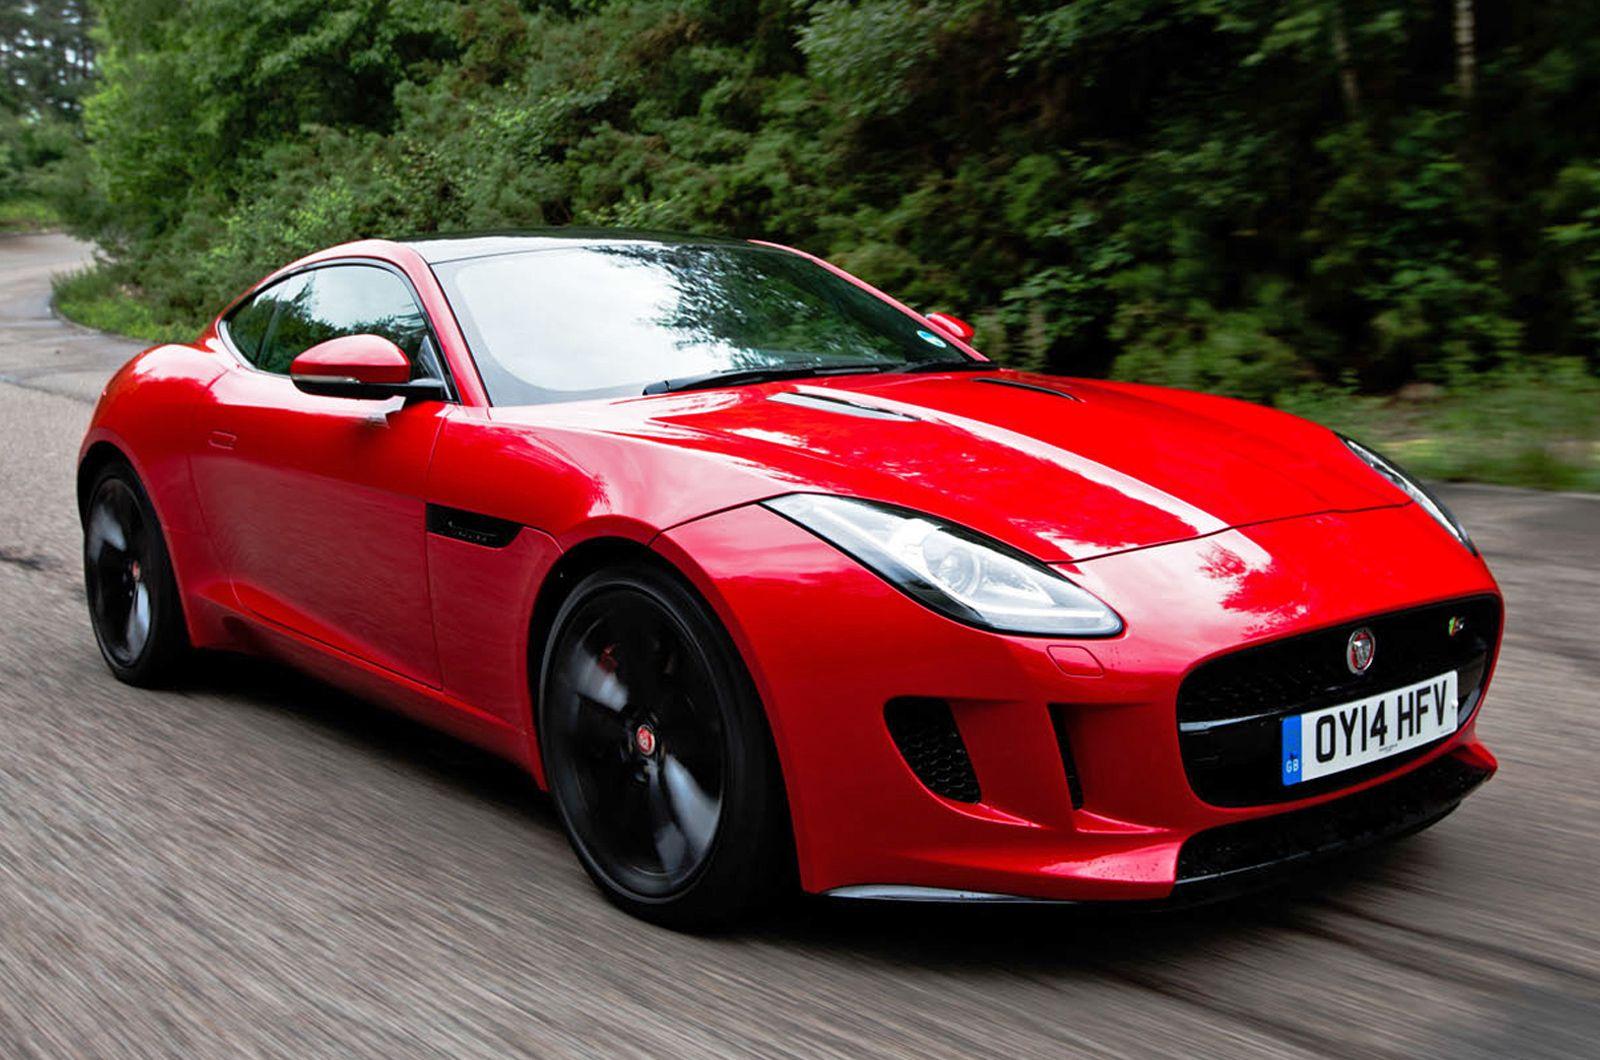 Jaguar Ftype coupe Jaguar f type, Luxury cars, Cars